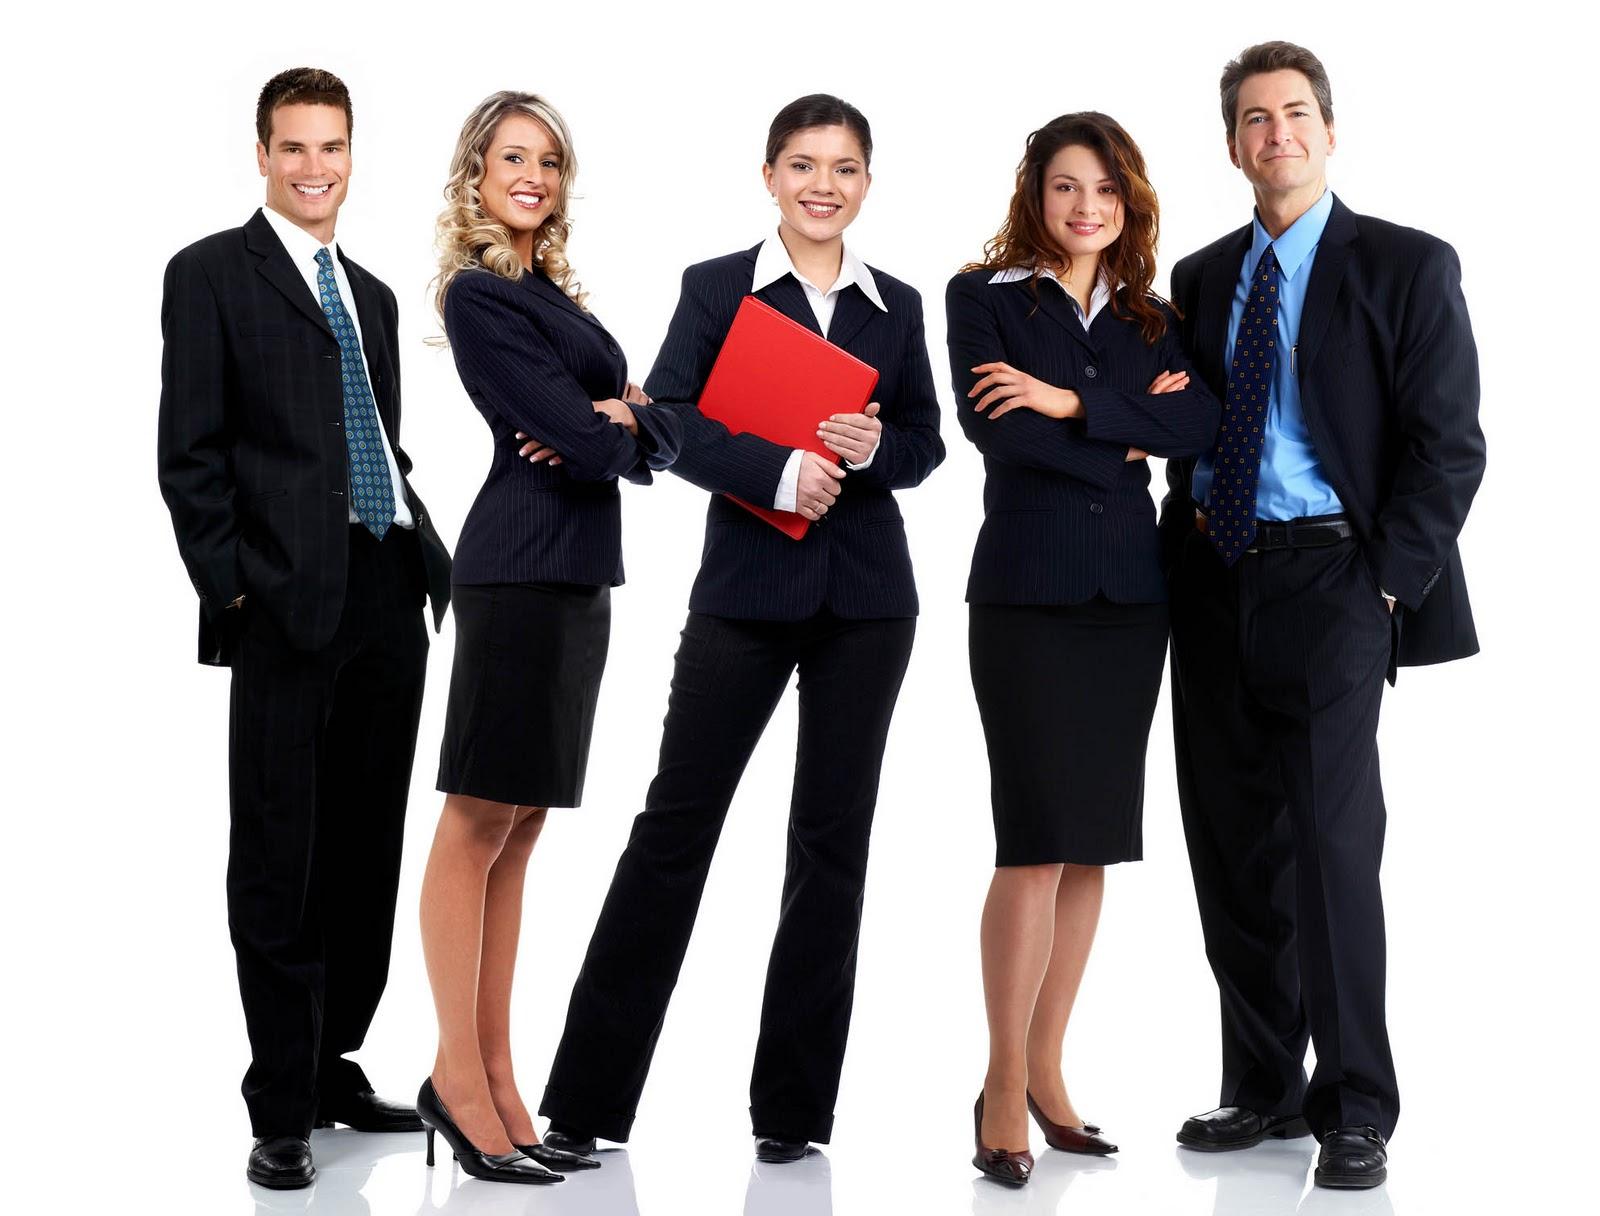 consejos-imagen-corporativa-1